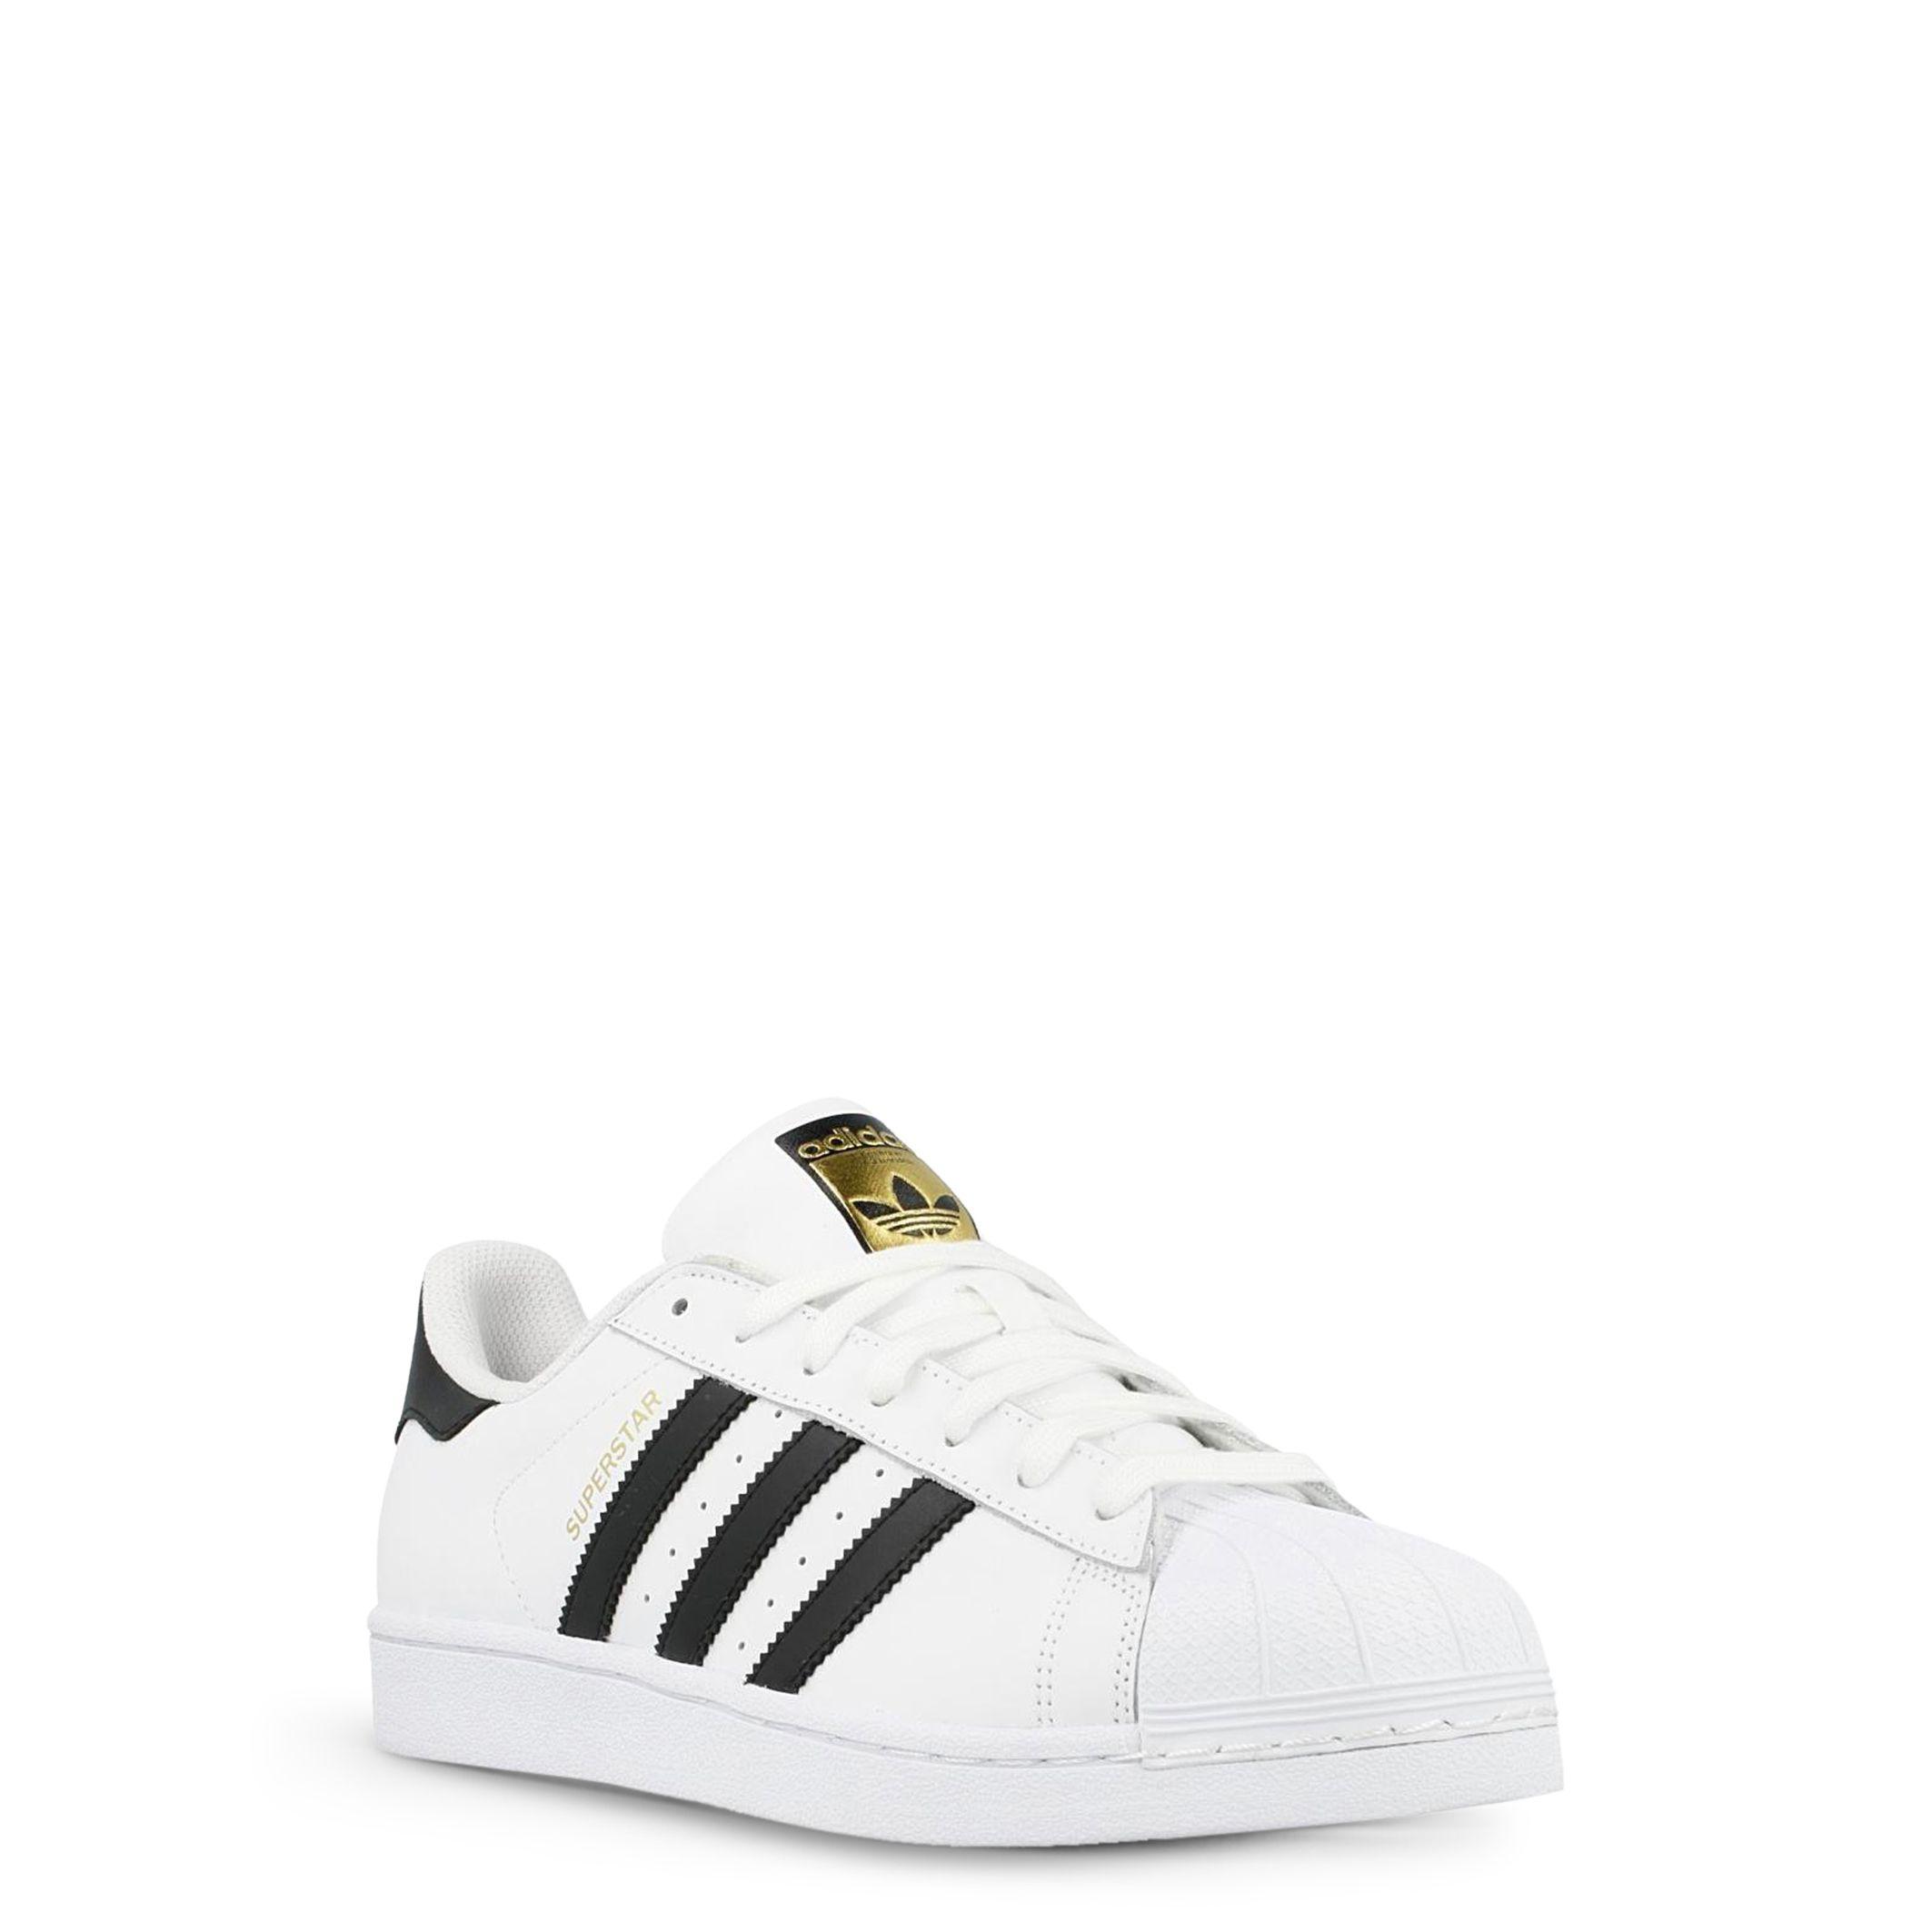 Adidas – Superstar – Blanco